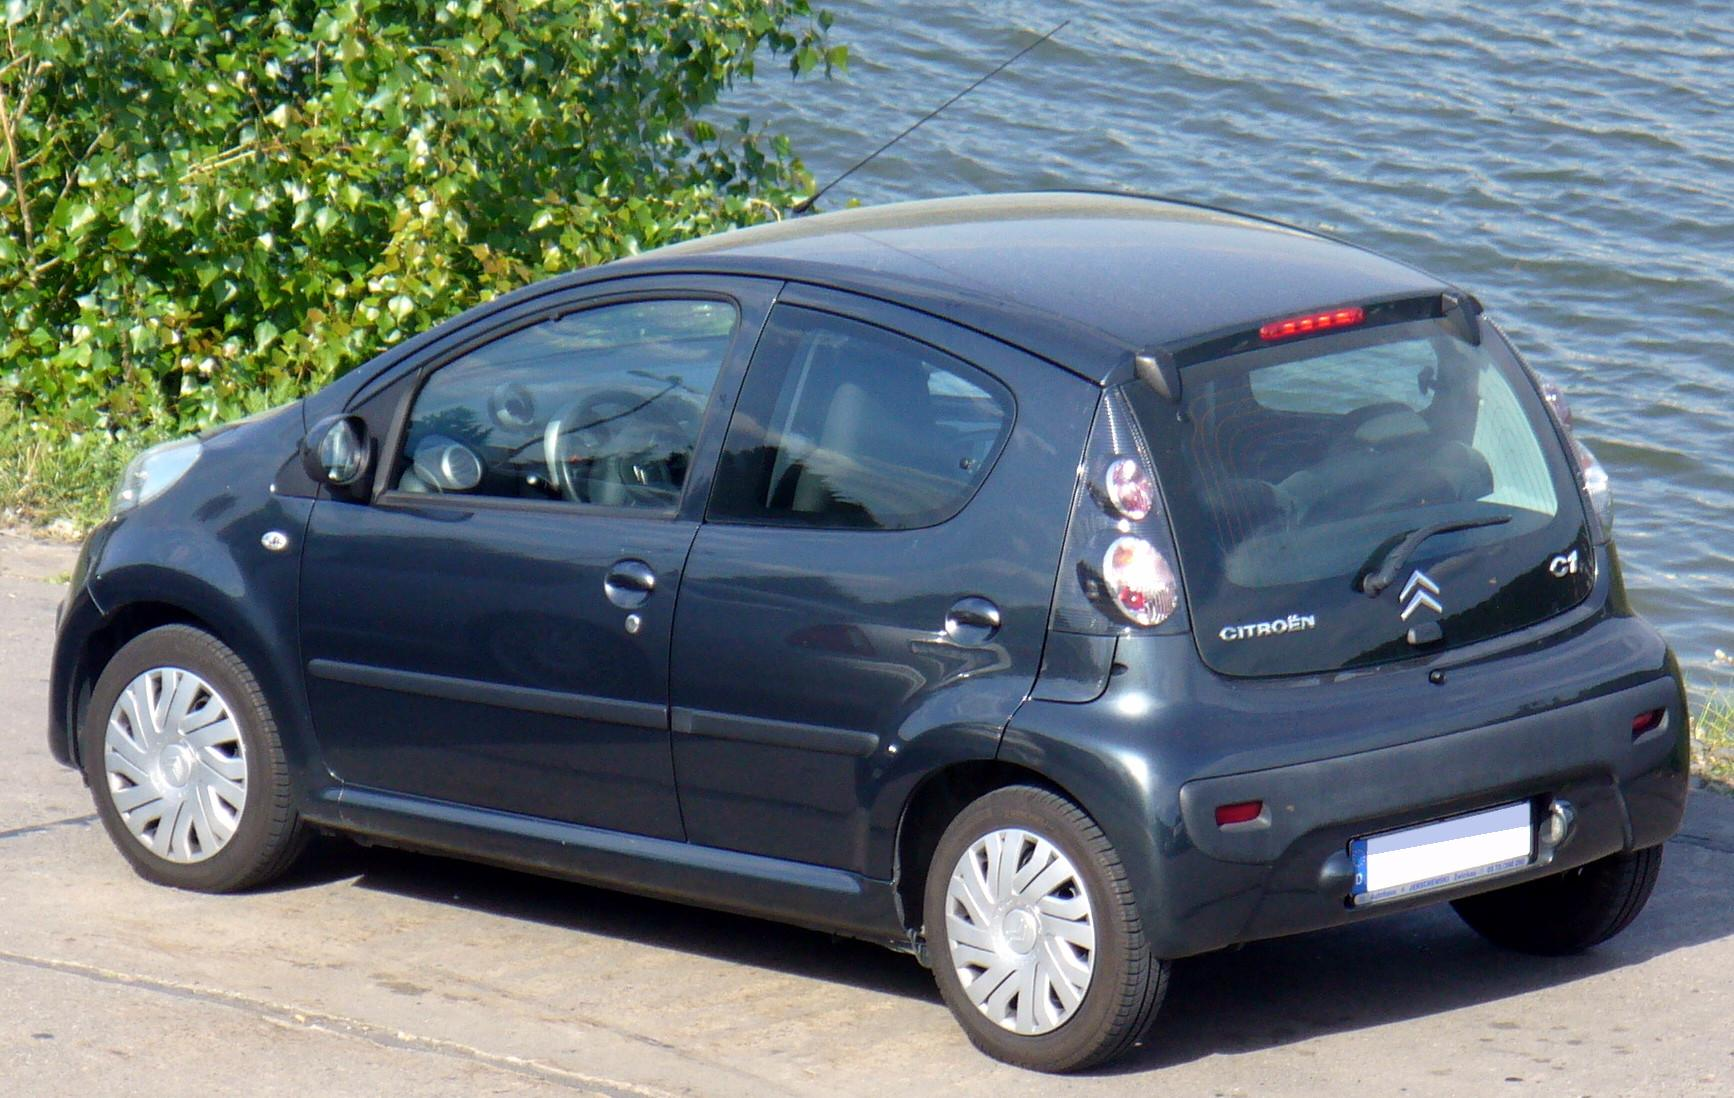 2007 Citroen C1 Partsopen